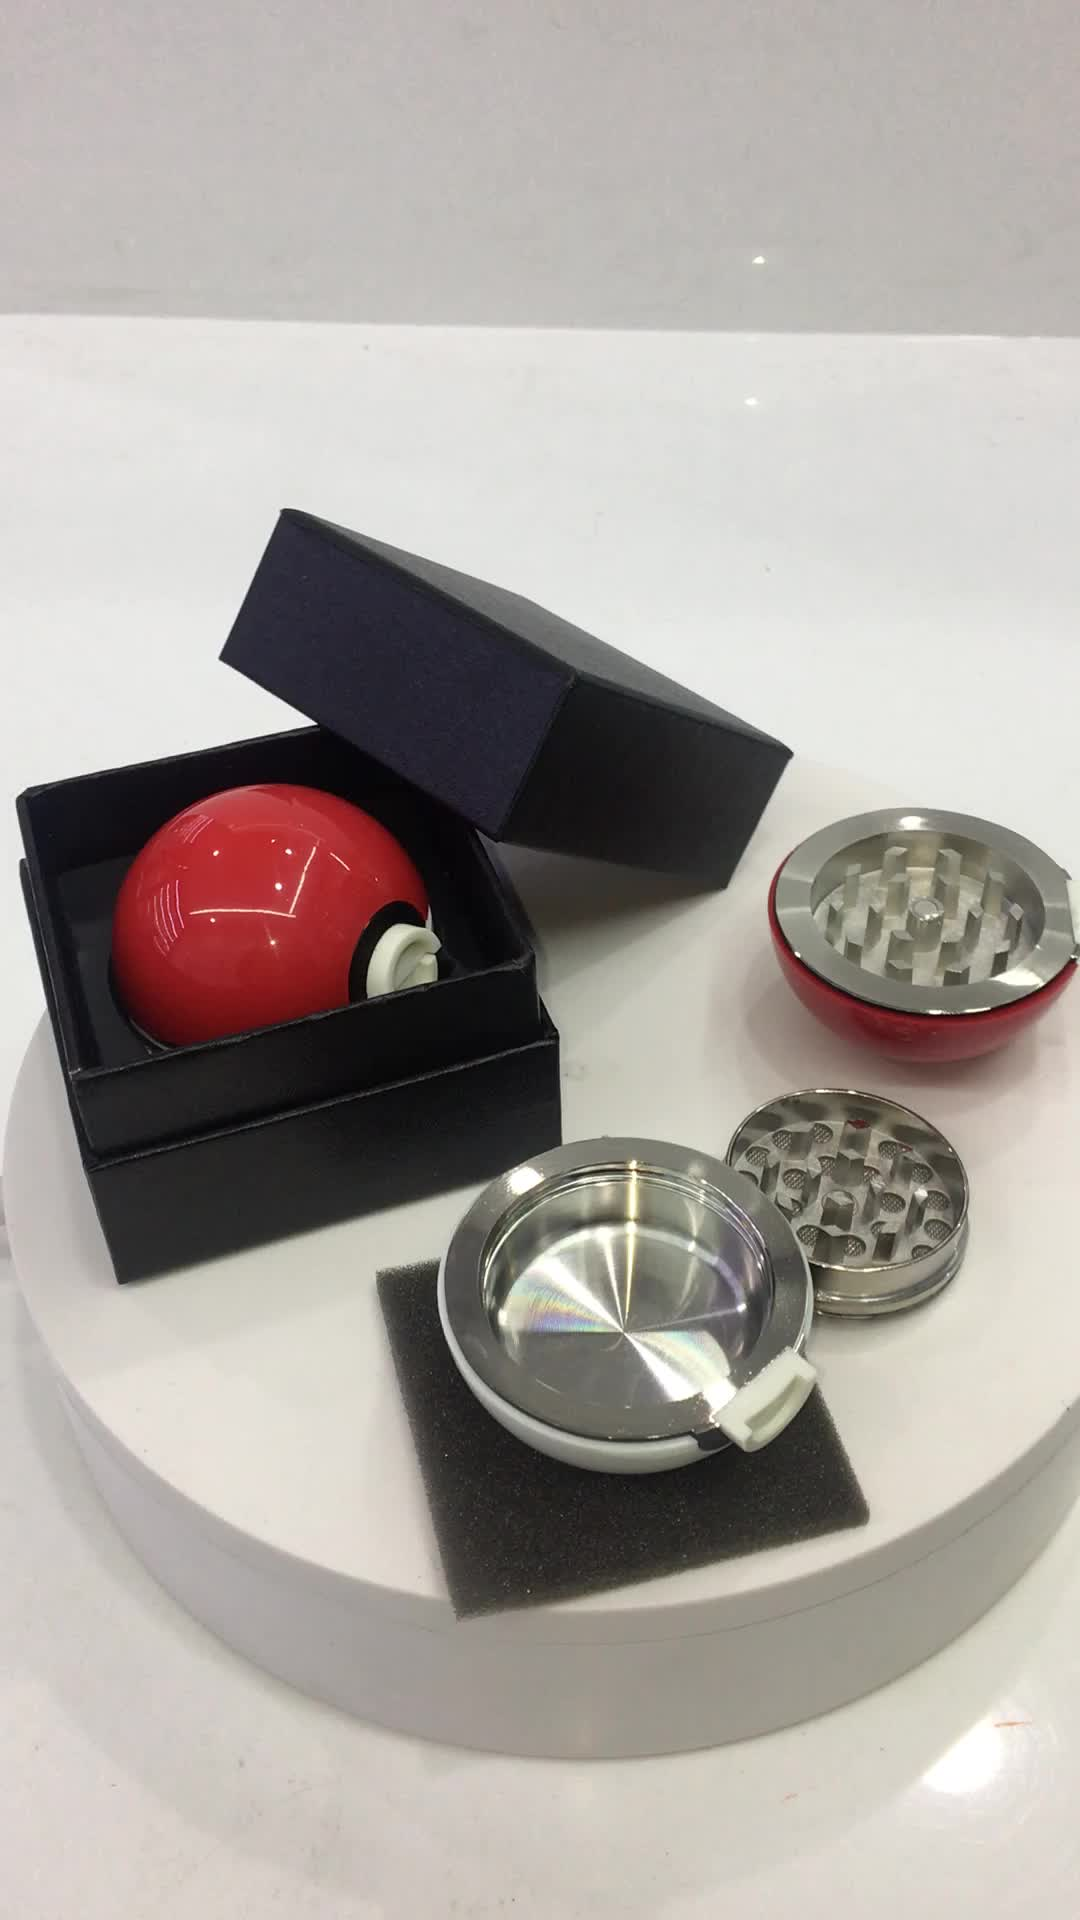 New Herb Pokemon Pokeball Tobacco Herb Grinder Supplies Accessories